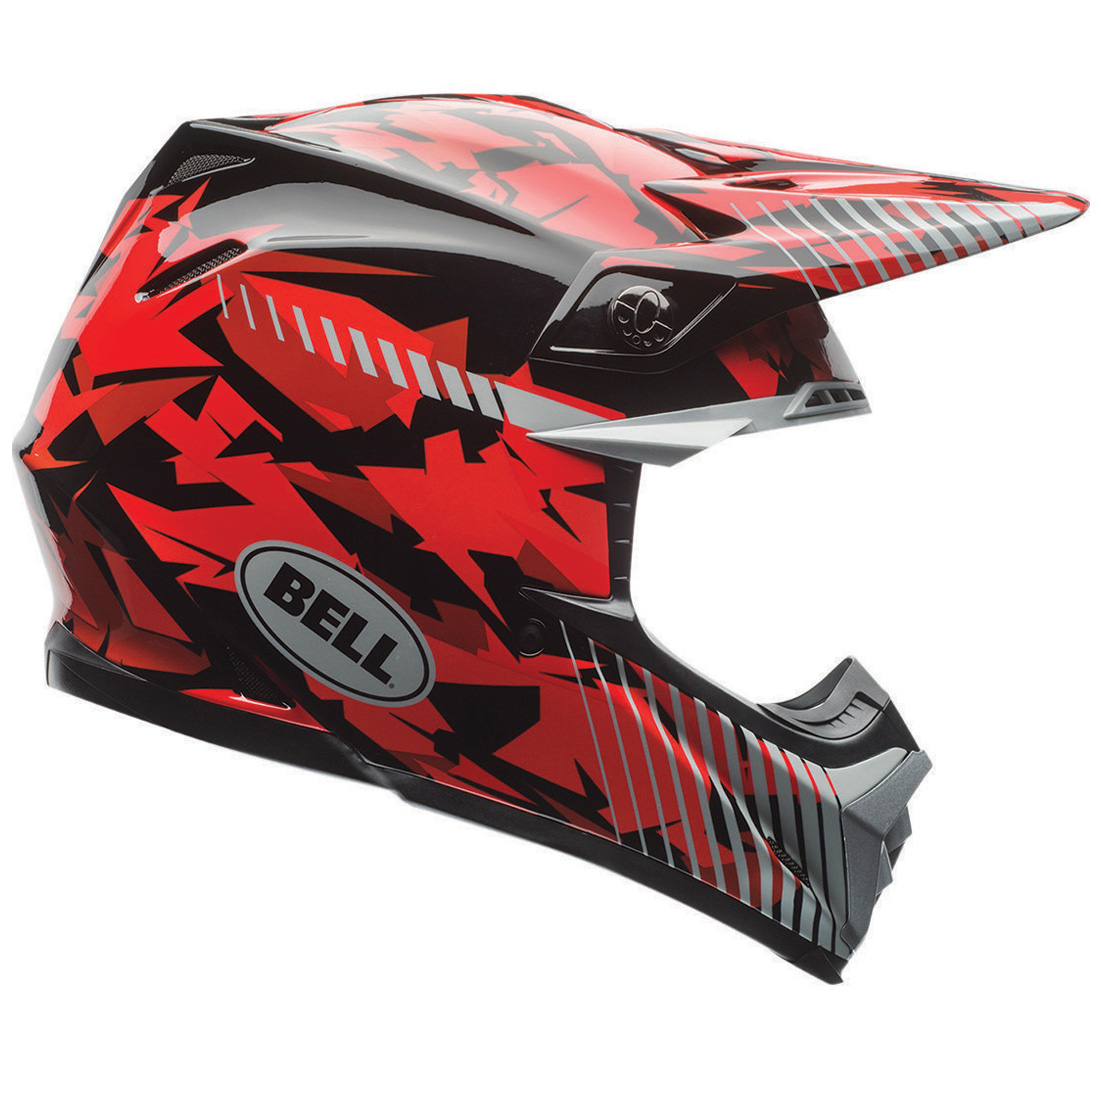 bell moto 9 motocross helmet bell. Black Bedroom Furniture Sets. Home Design Ideas